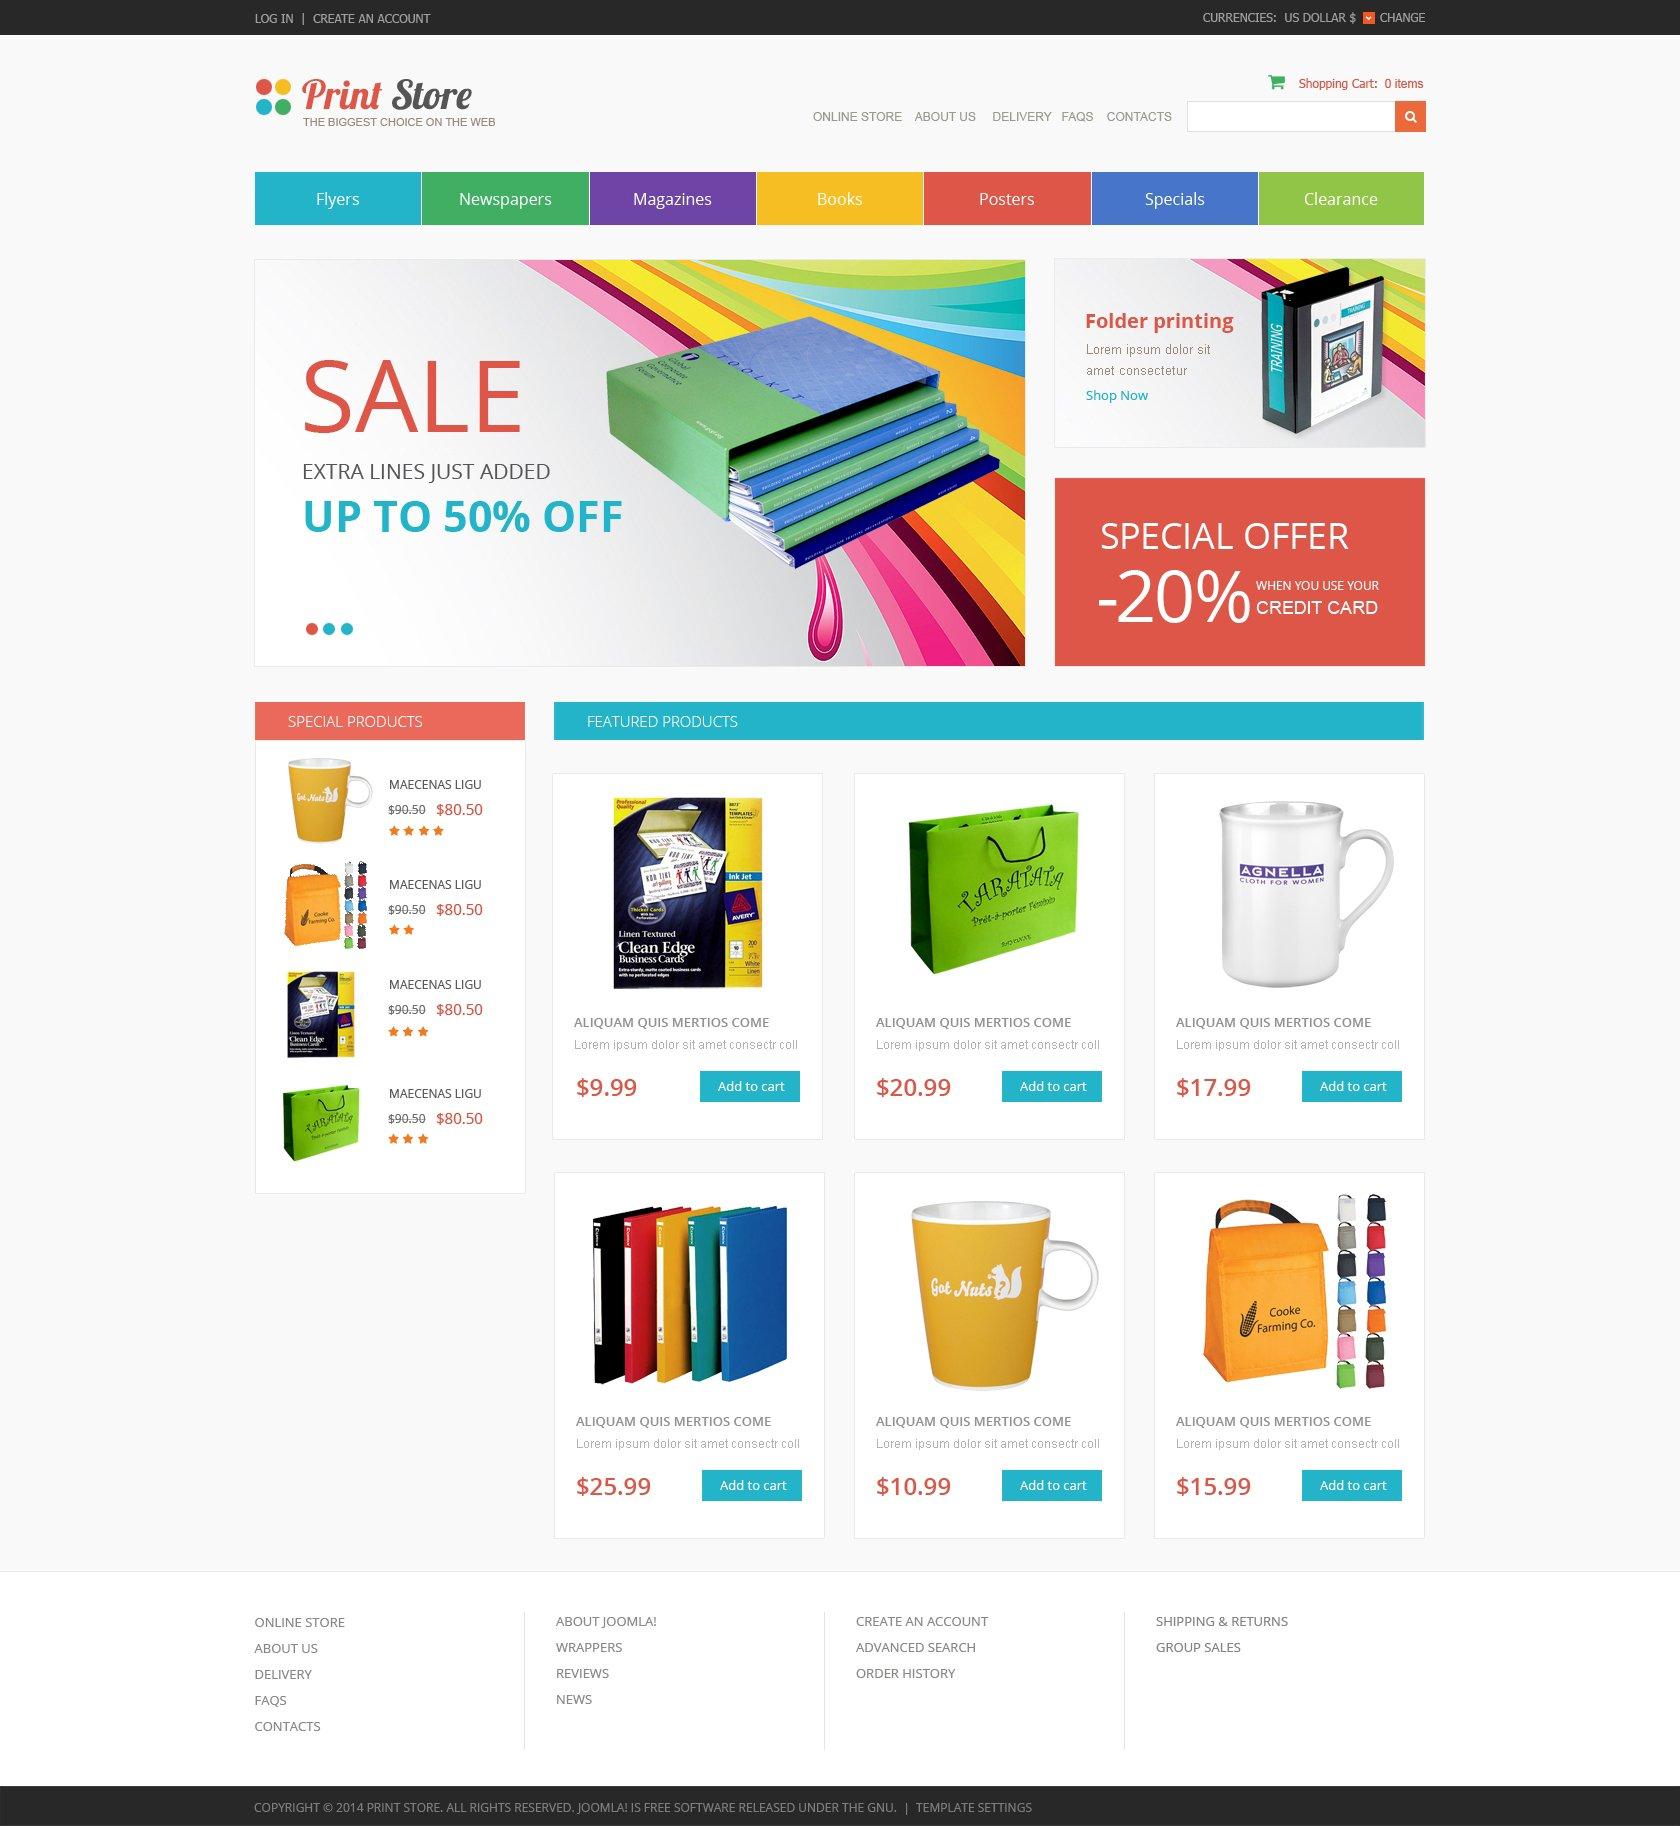 print store virtuemart template 49326. Black Bedroom Furniture Sets. Home Design Ideas